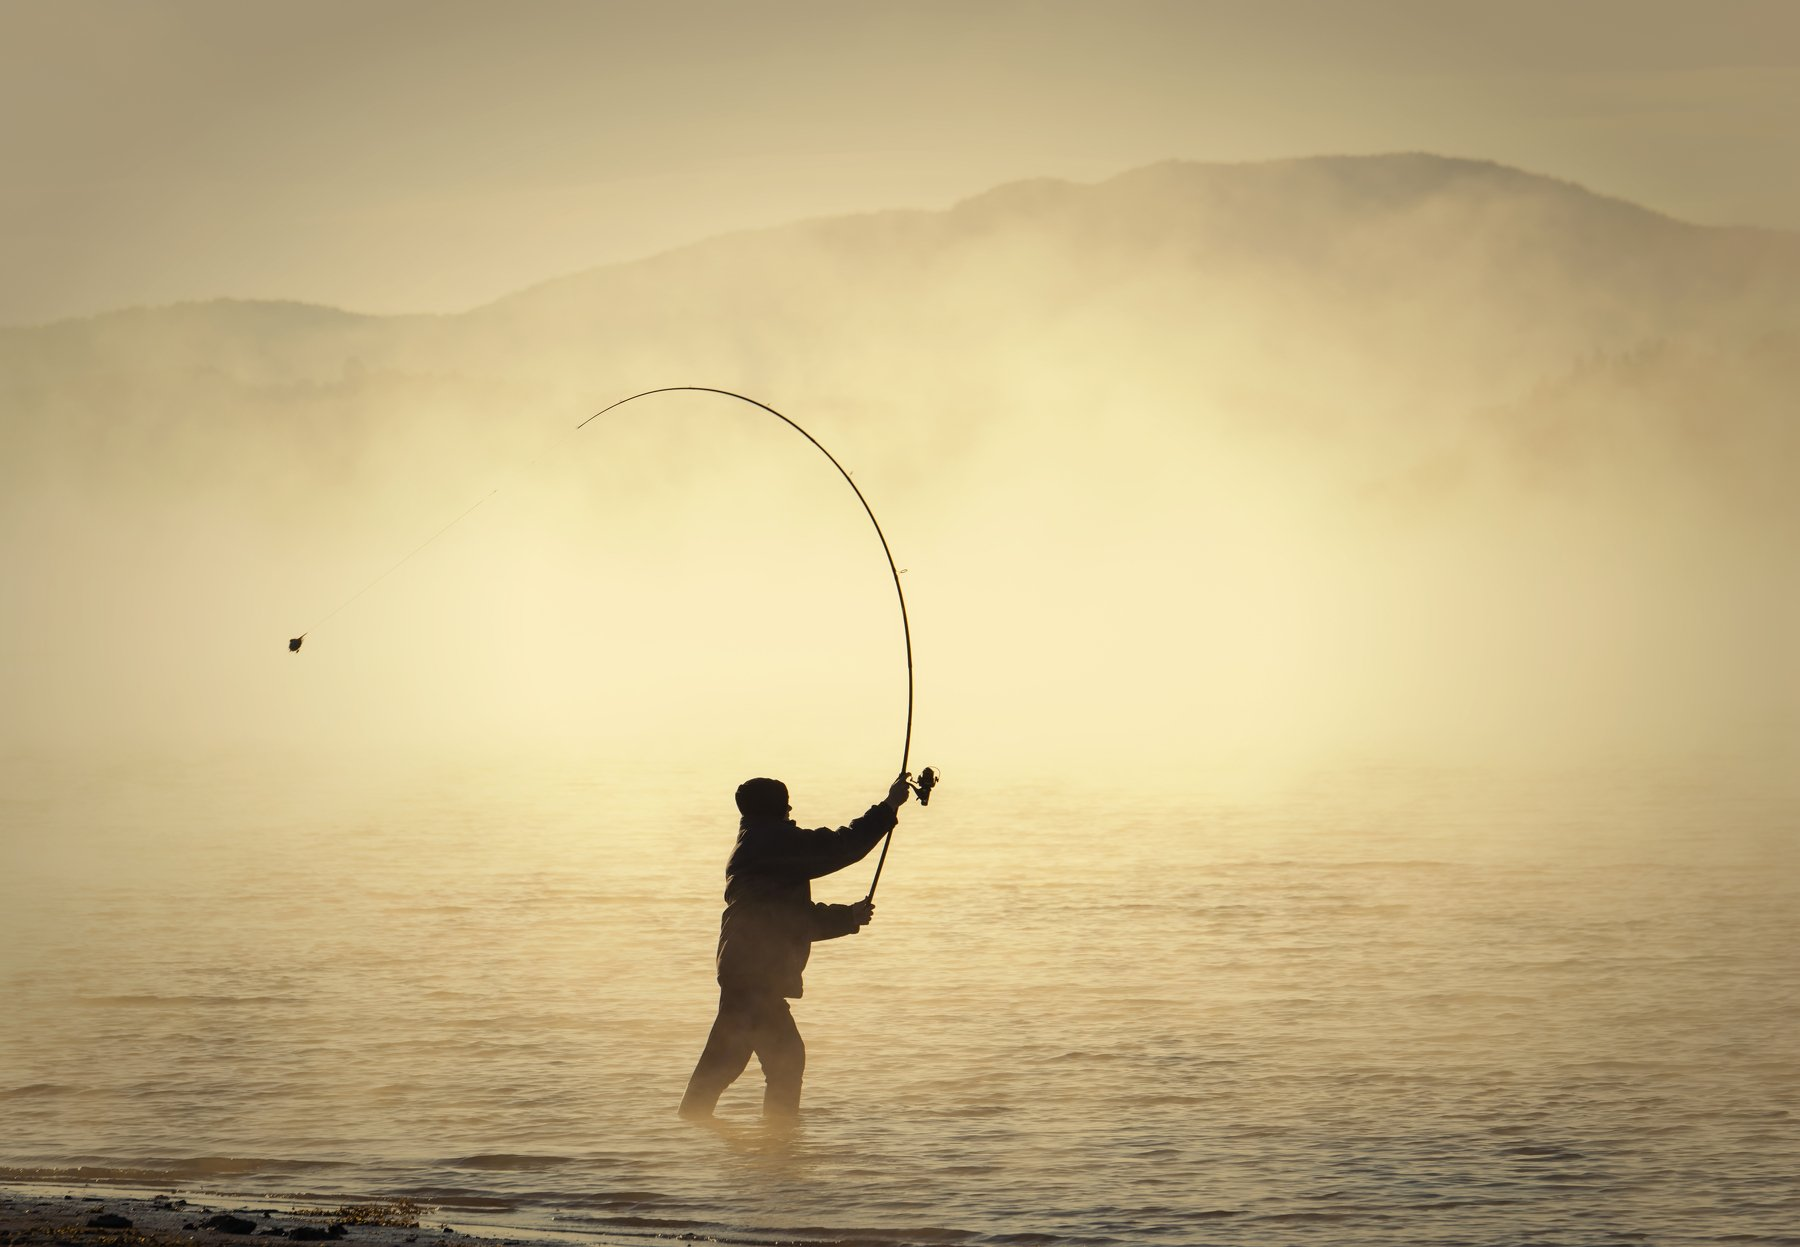 болгария, пейзаж, озеро, восход солнца, туман, landscape, fishing, carp, autumn,people, casting, sunrise, Genadi Dochev